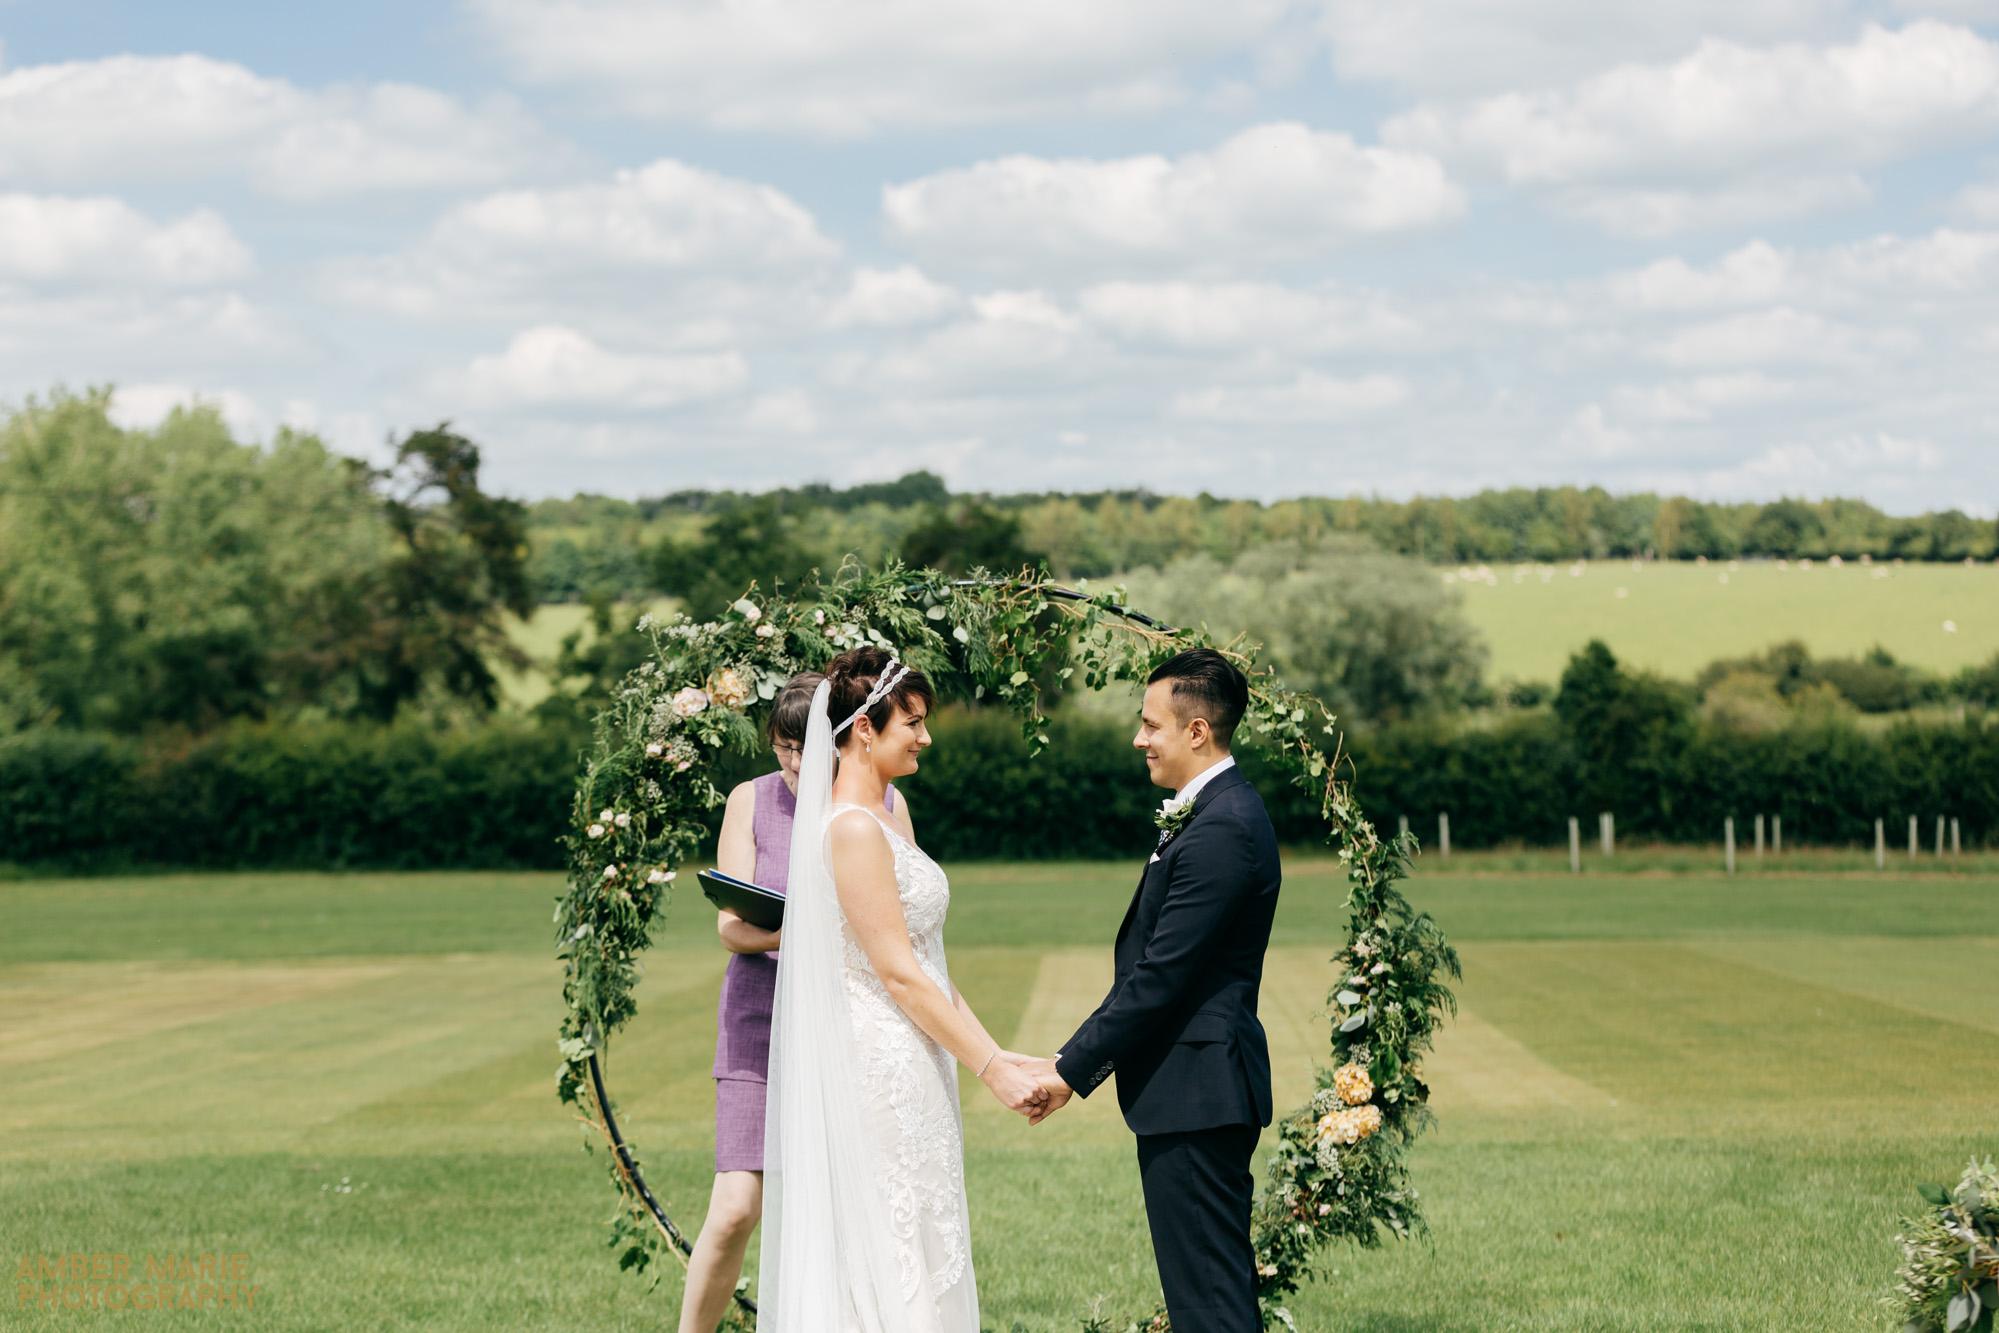 outdoor humanist wedding photography